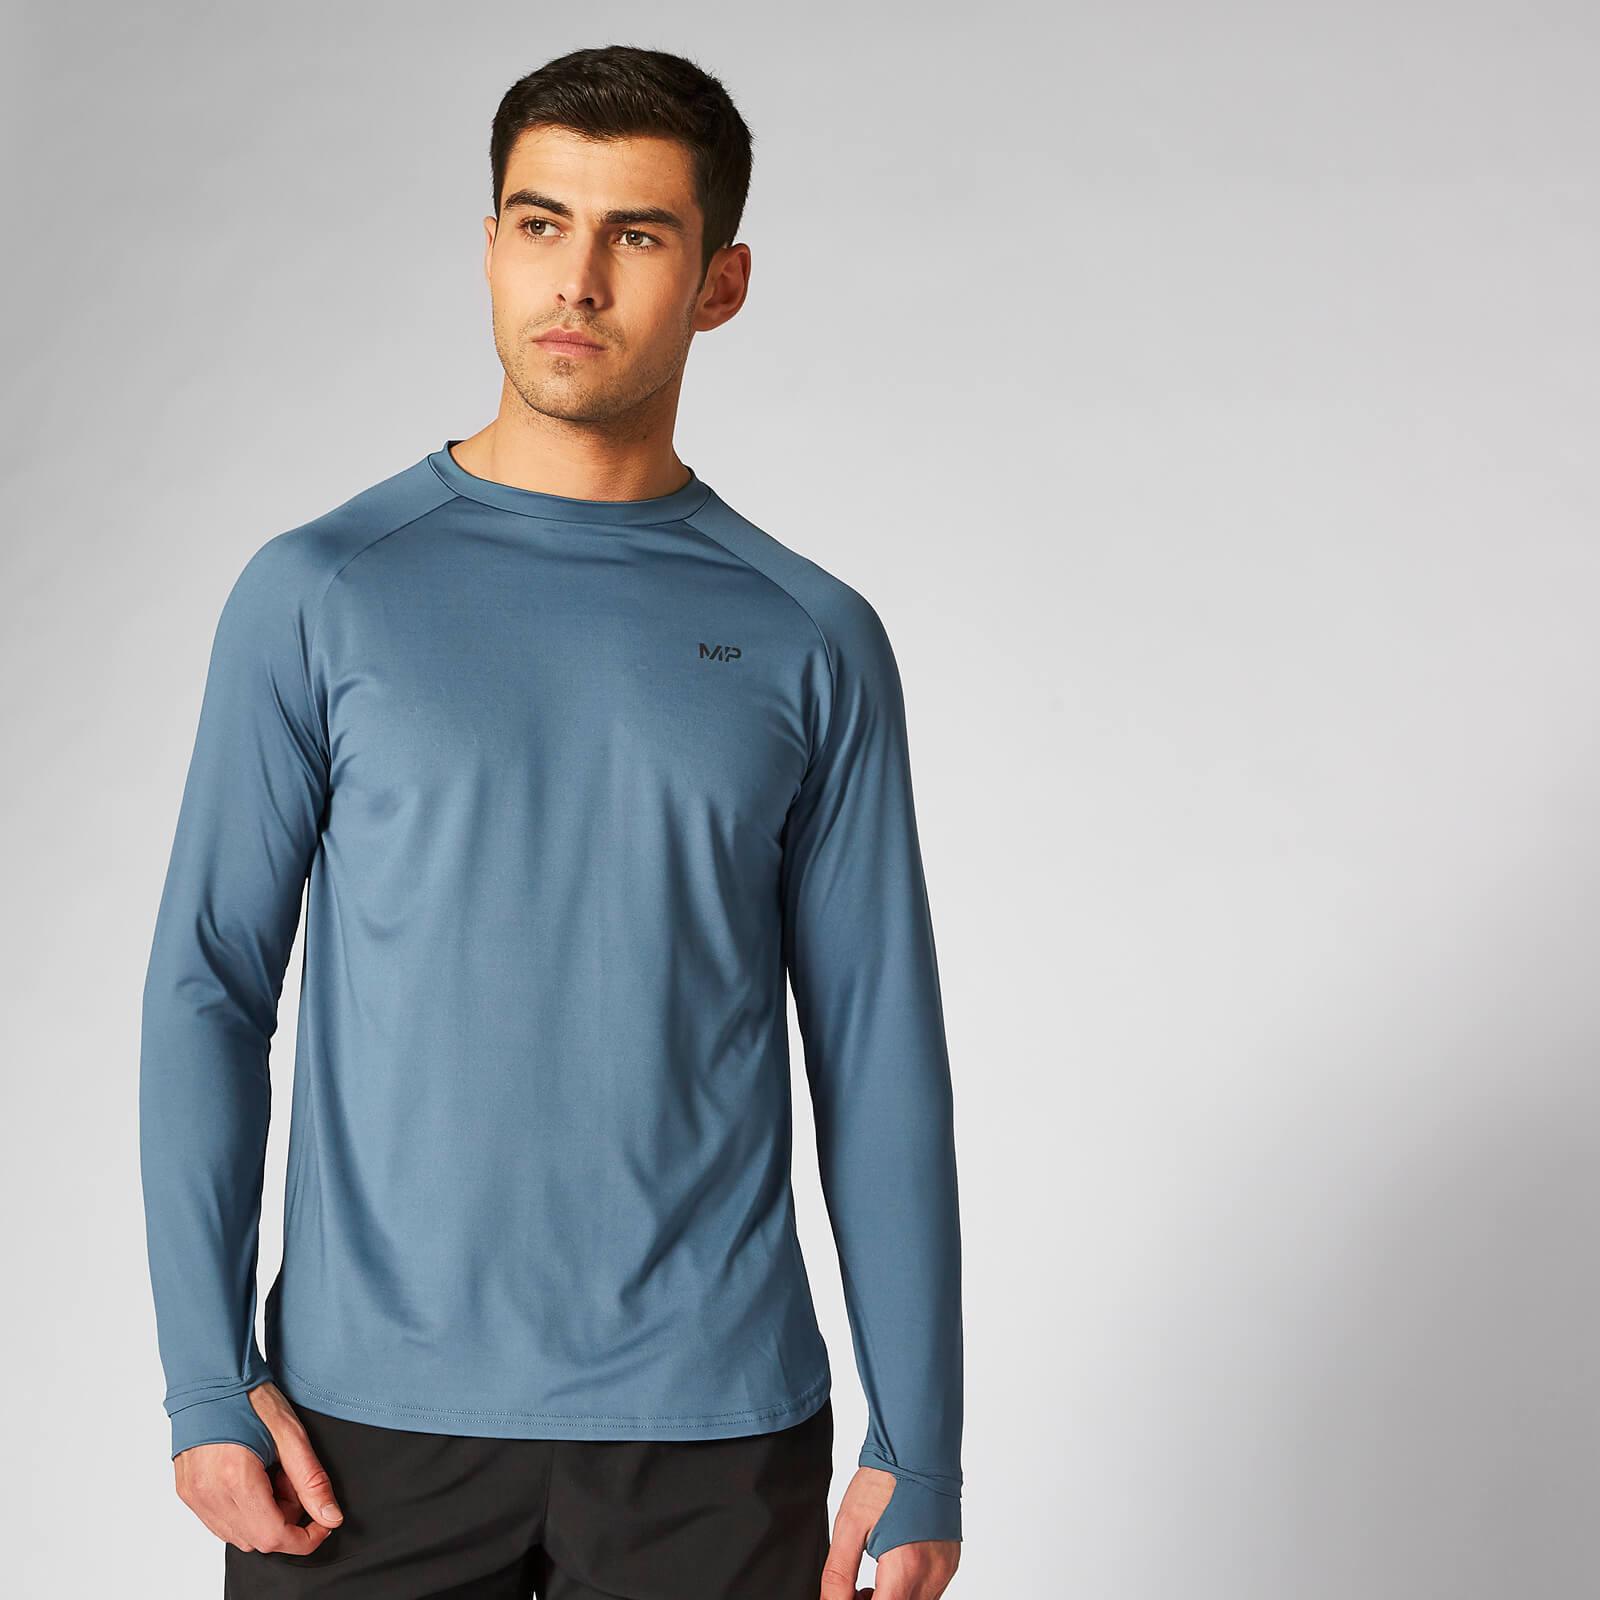 Myprotein Dry-Tech Infinity Long-Sleeve T-Shirt - Cadet Blue - XS